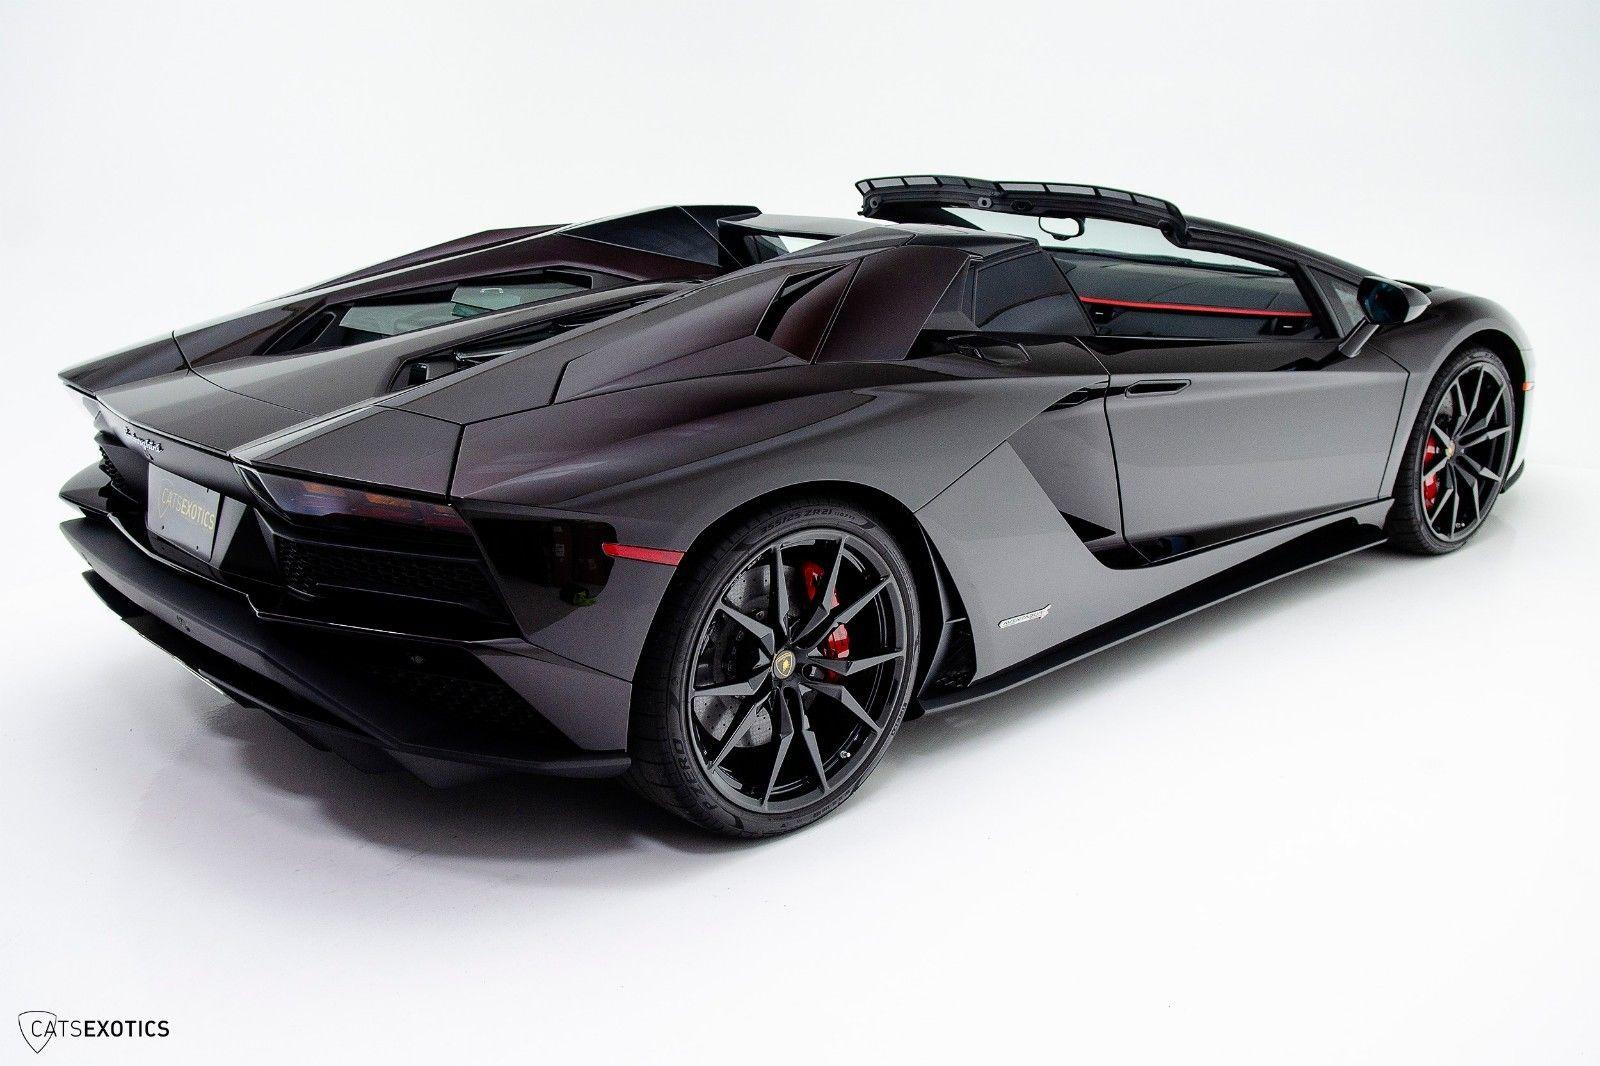 Great 2017 Aventador LP740-4S 2017 Lamborghini Aventador ...